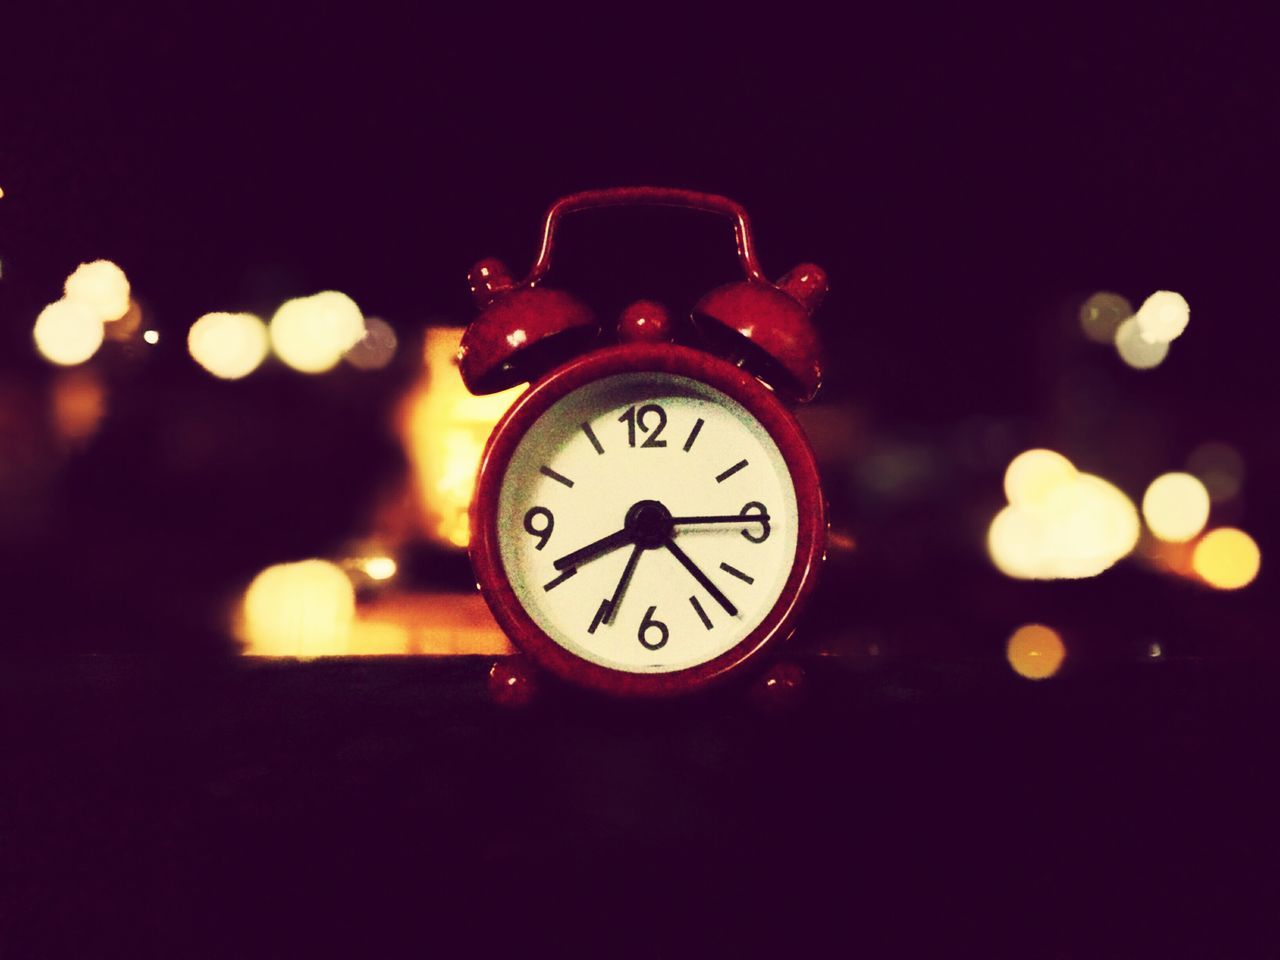 Alarm AlarmClock Clock Time Red Night Nightphotography Night Lights Nightshot Photography DSLR AsusPixelMaster Instagram Like Dark Camera